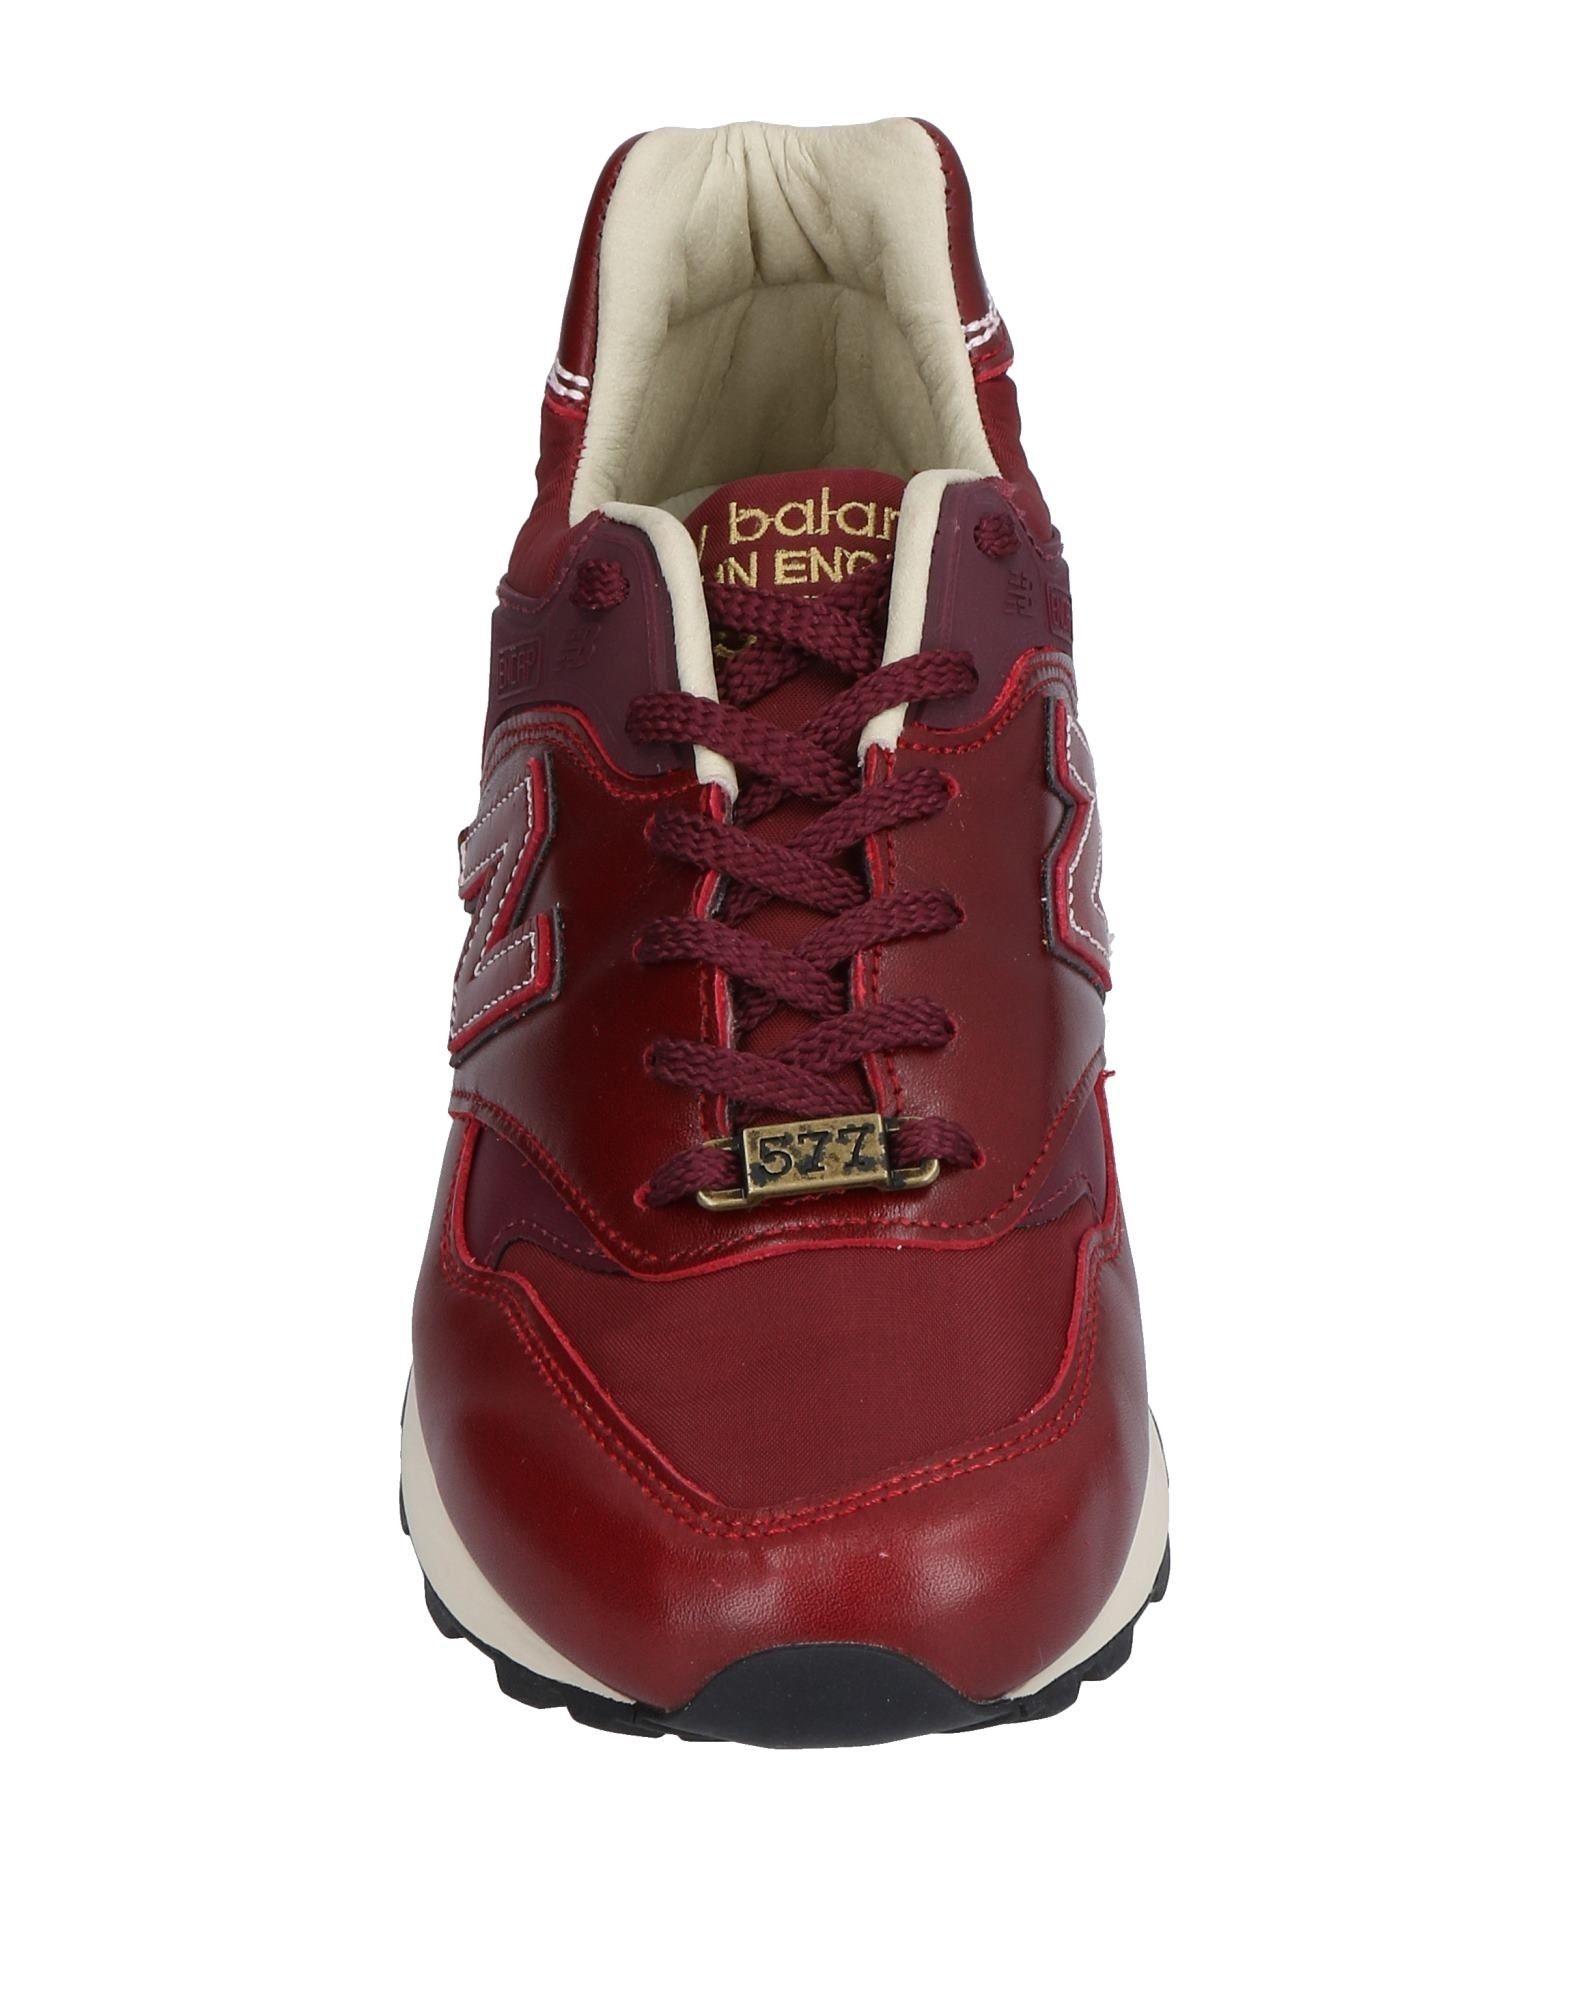 New Balance Sneakers Herren  11512465IB Gute Qualität beliebte Schuhe